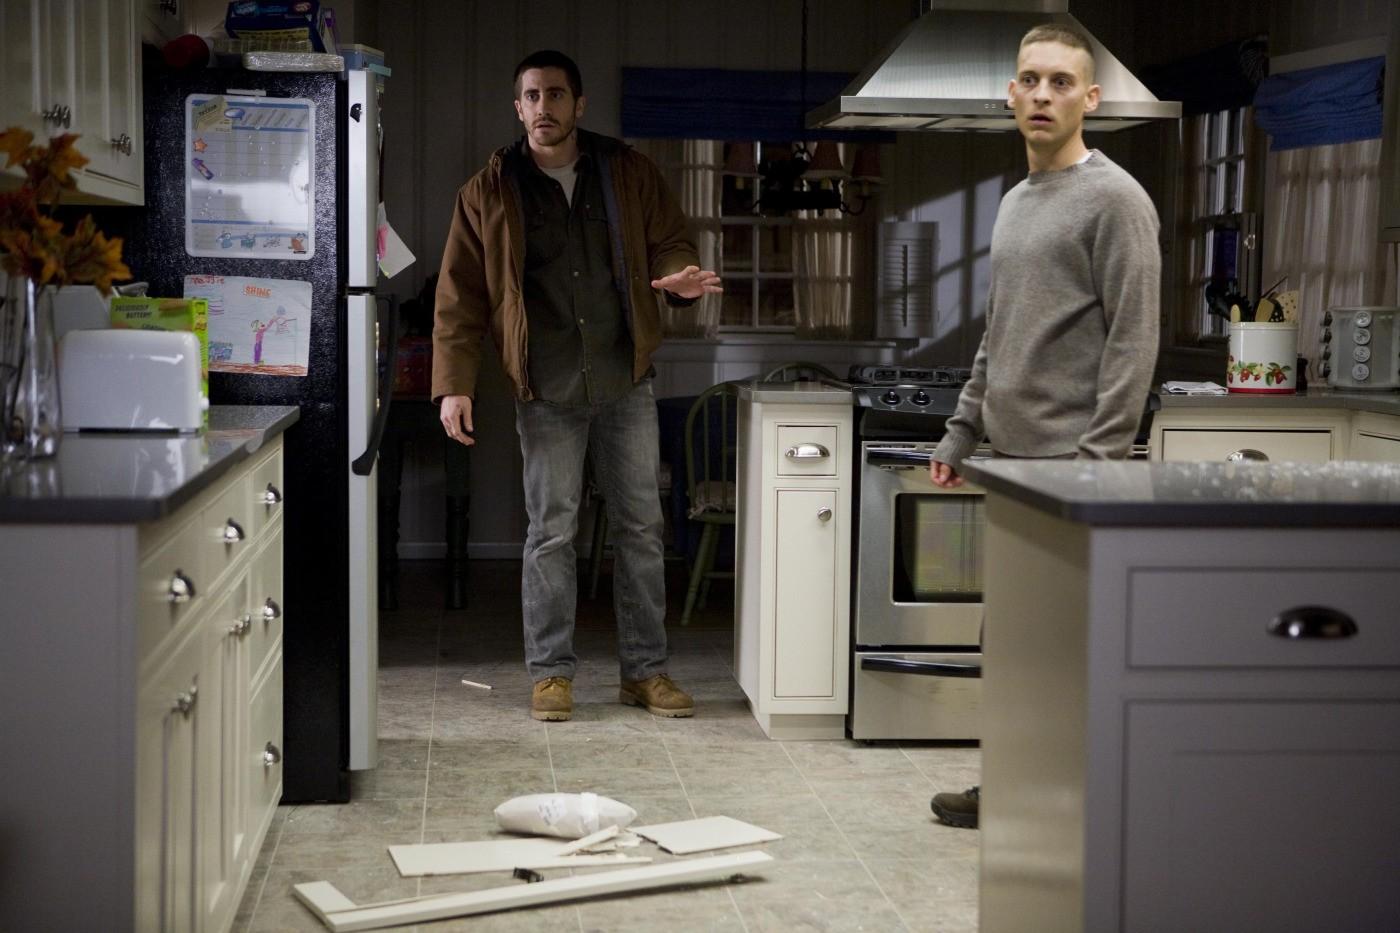 Jake Gyllenhaal,Tobey Maguire